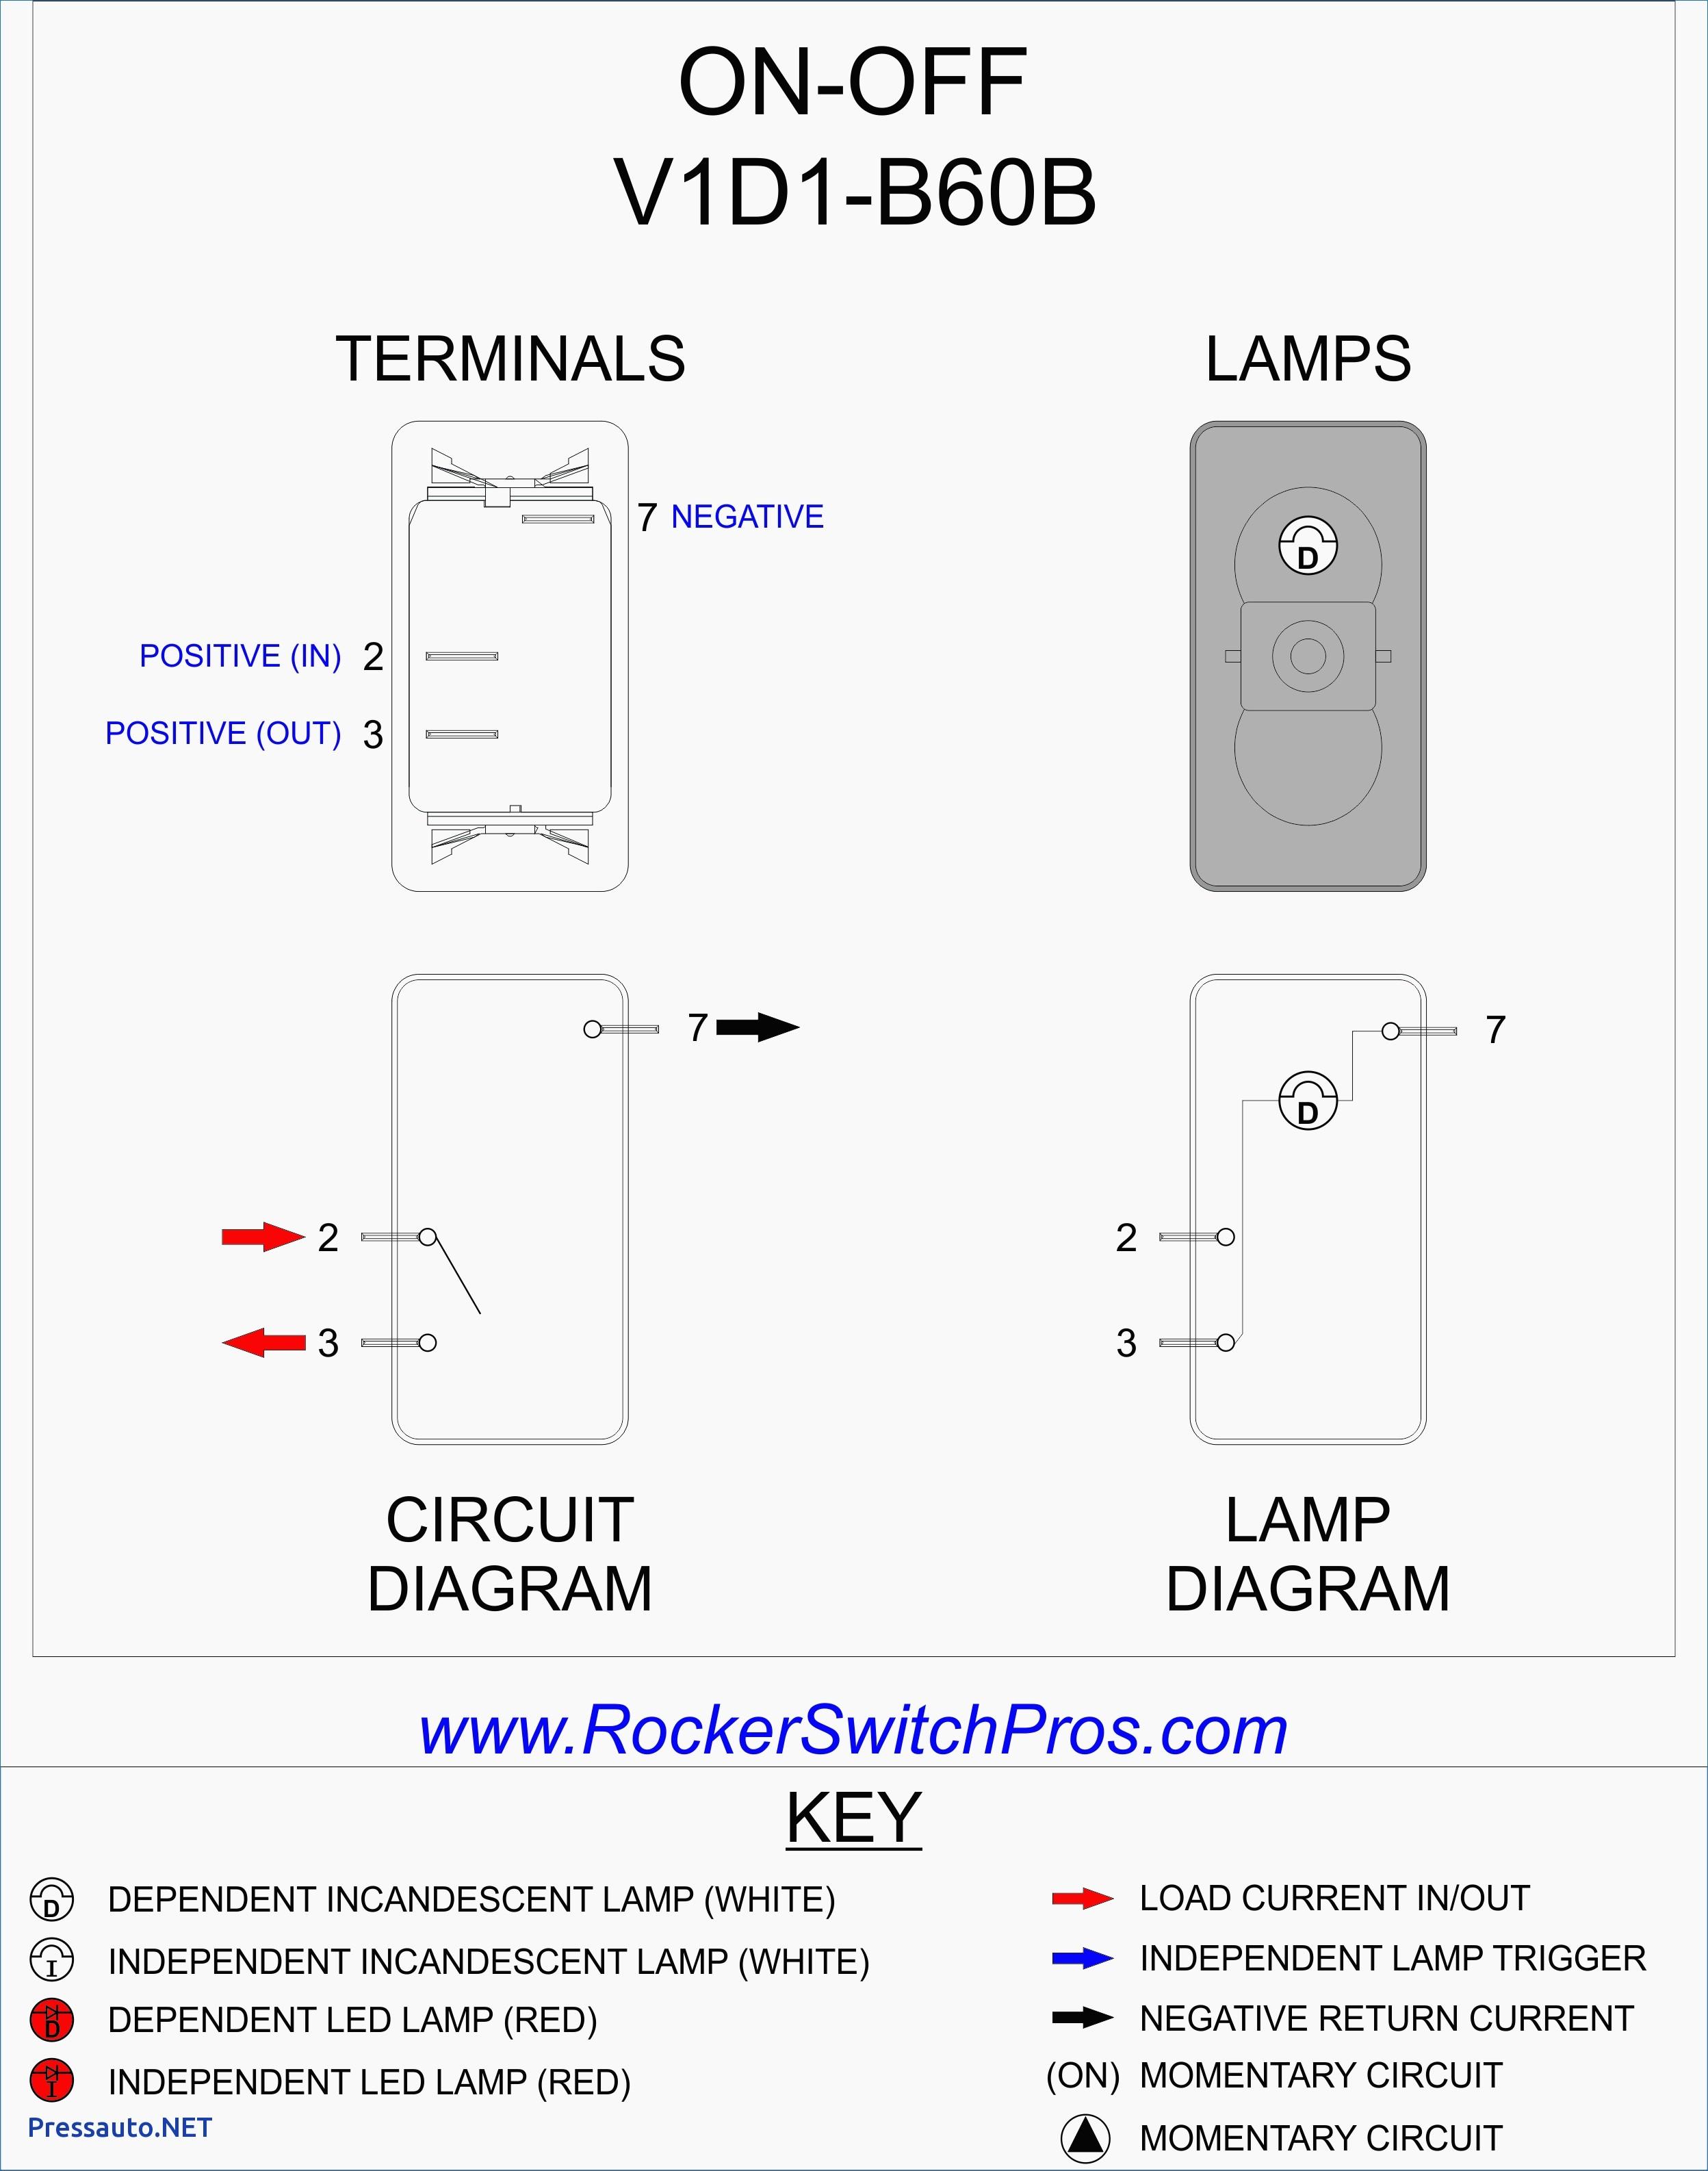 Dorman Rocker Switch Wiring Diagram 7 Pin. . Wiring Diagram on